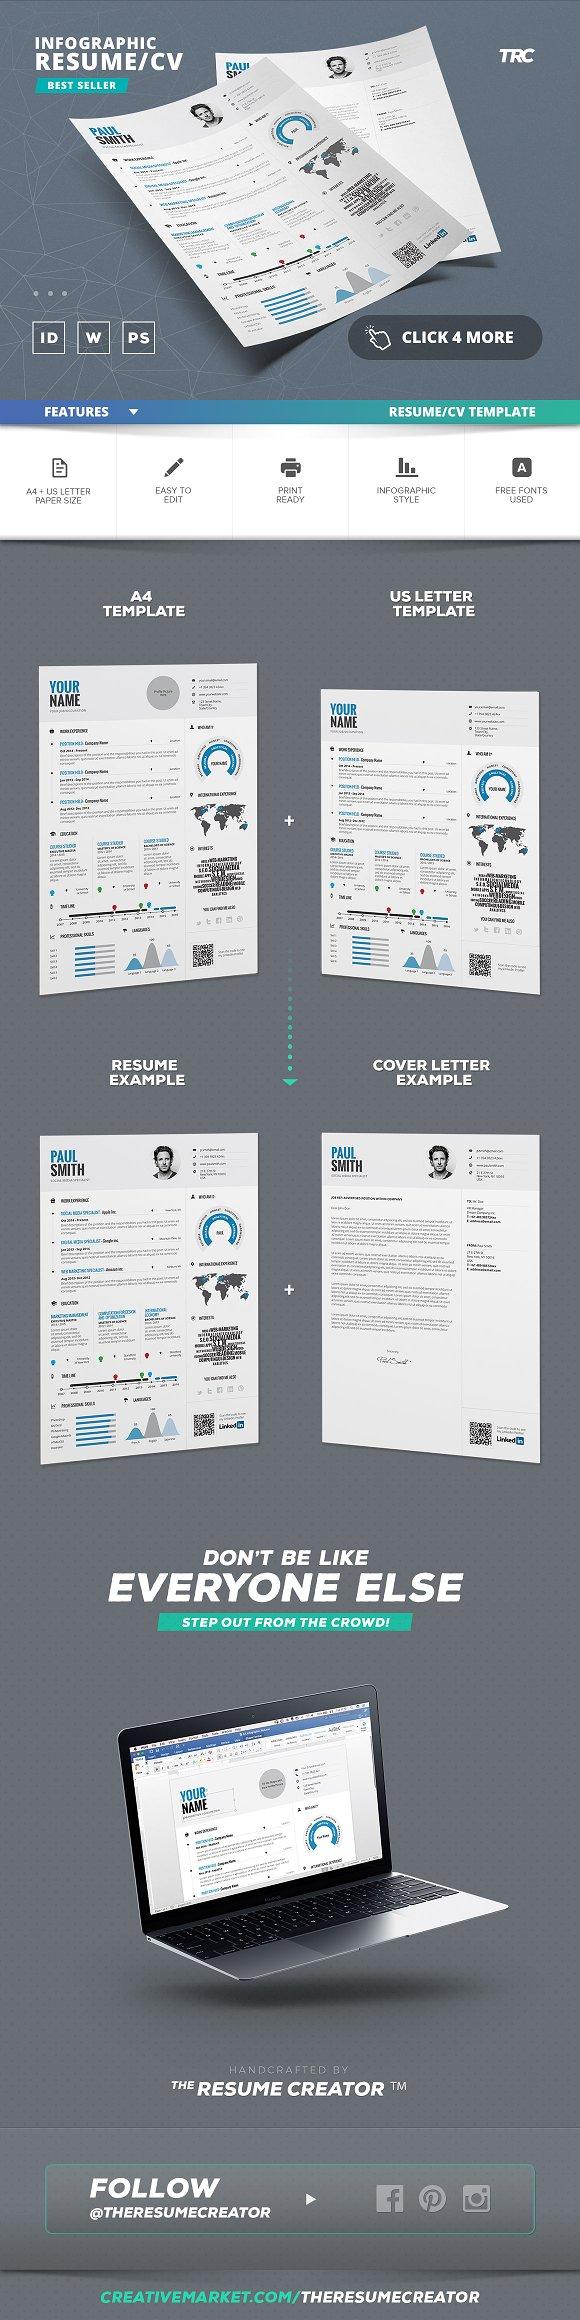 Infographic Resume/Cv Template Vol.1 ~ Resume Templates ~ Creative ...